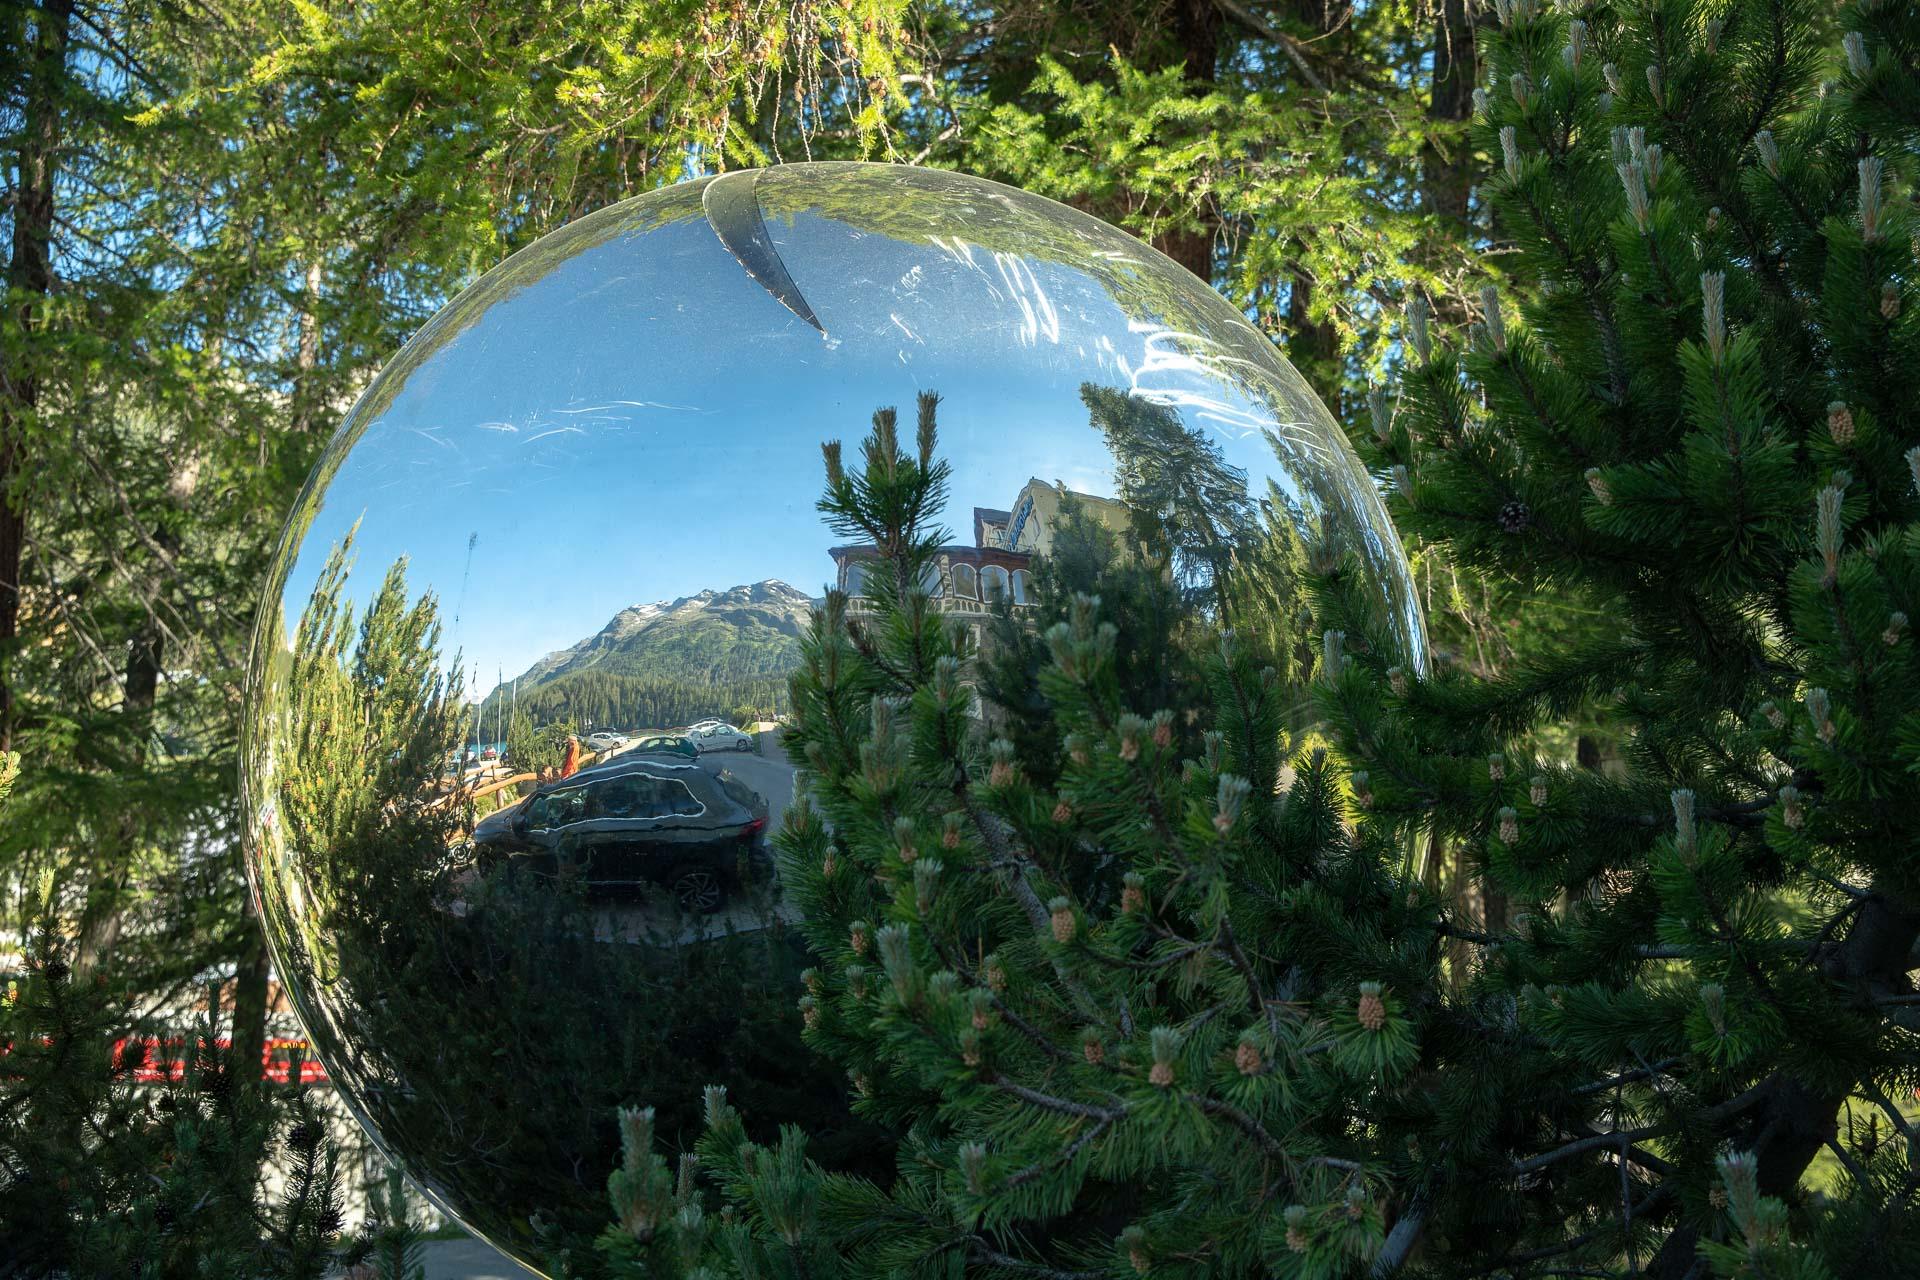 Waldhotel, St. Moritz